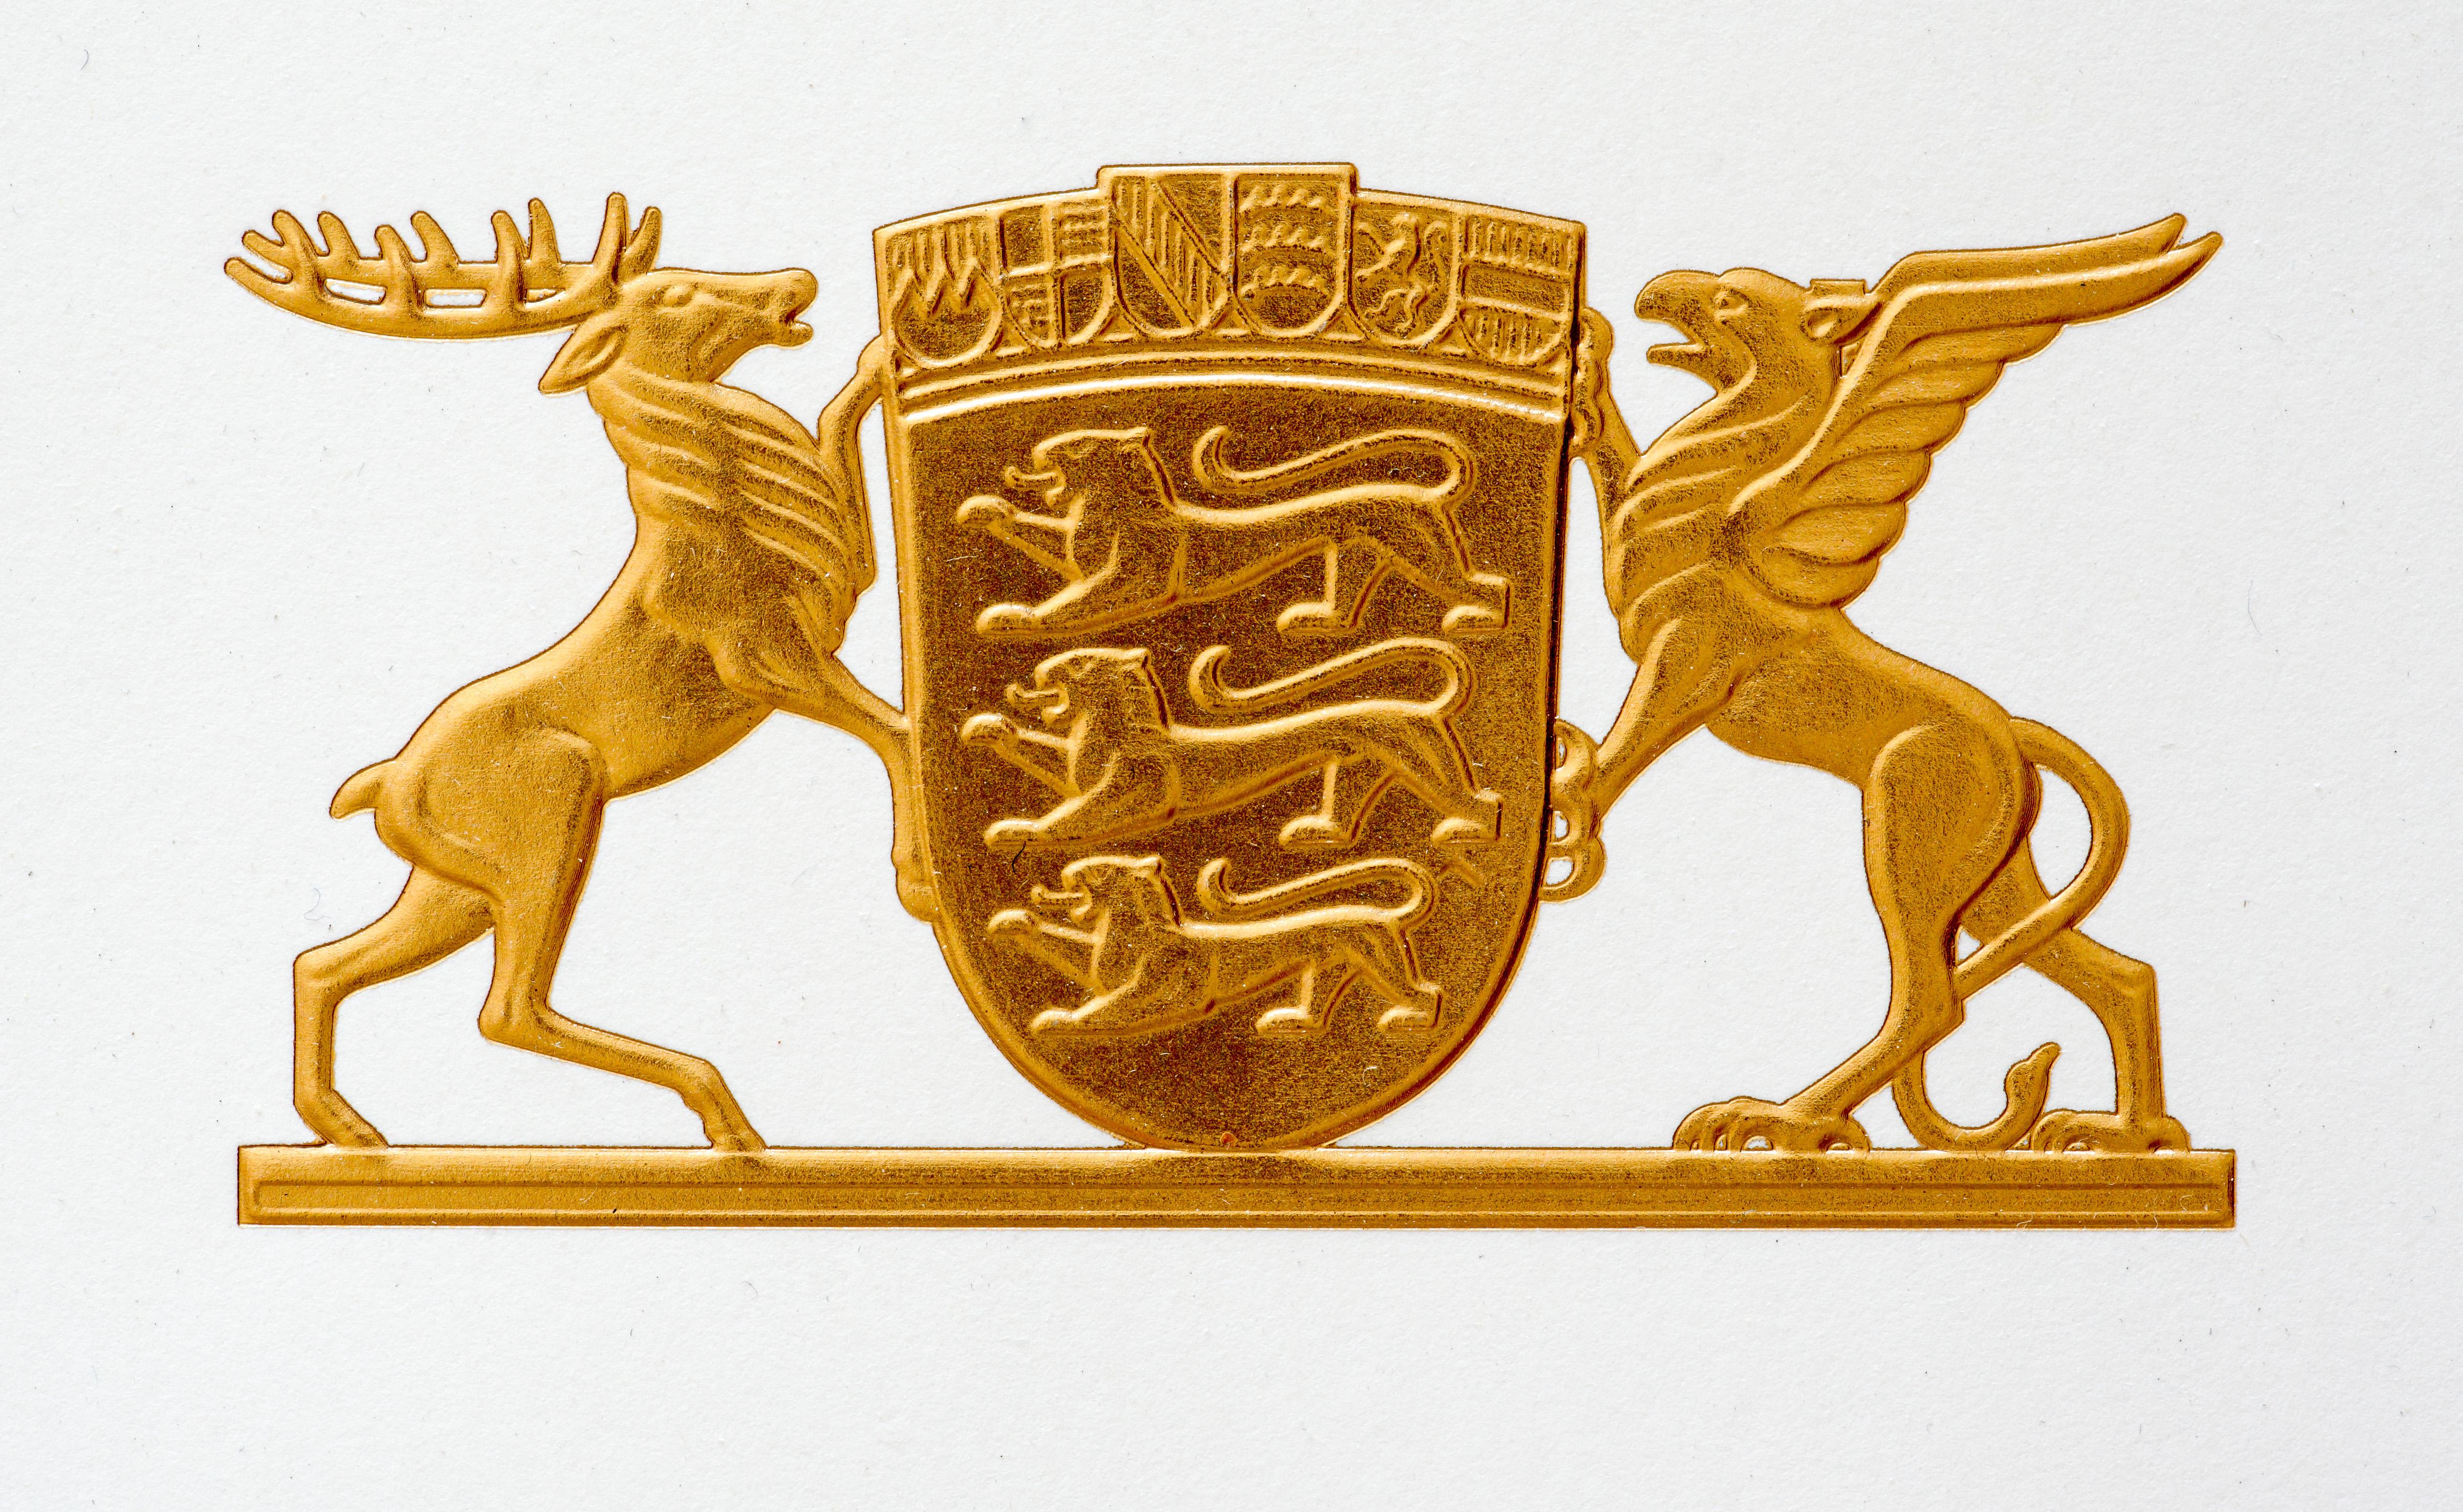 Prägefolie_Wappen gold